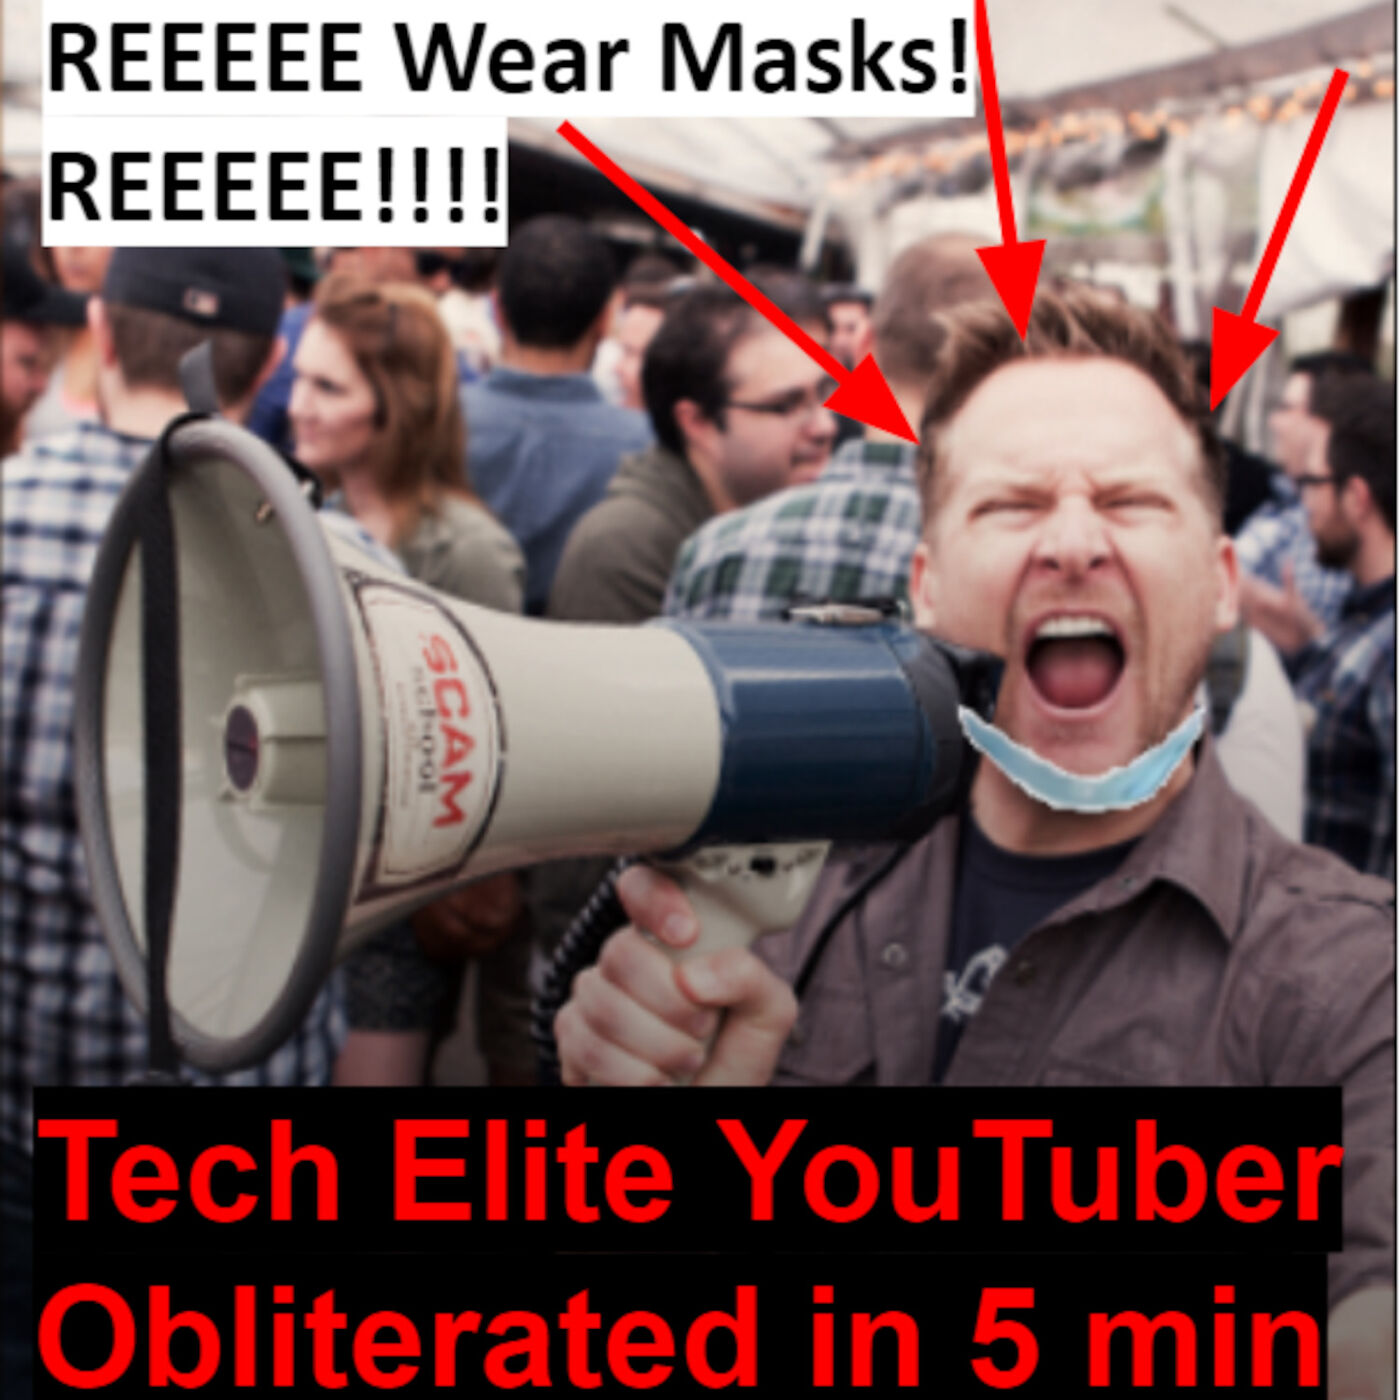 0033 Sir Gene Speaks - Gene Slays Youtuber on Masks!